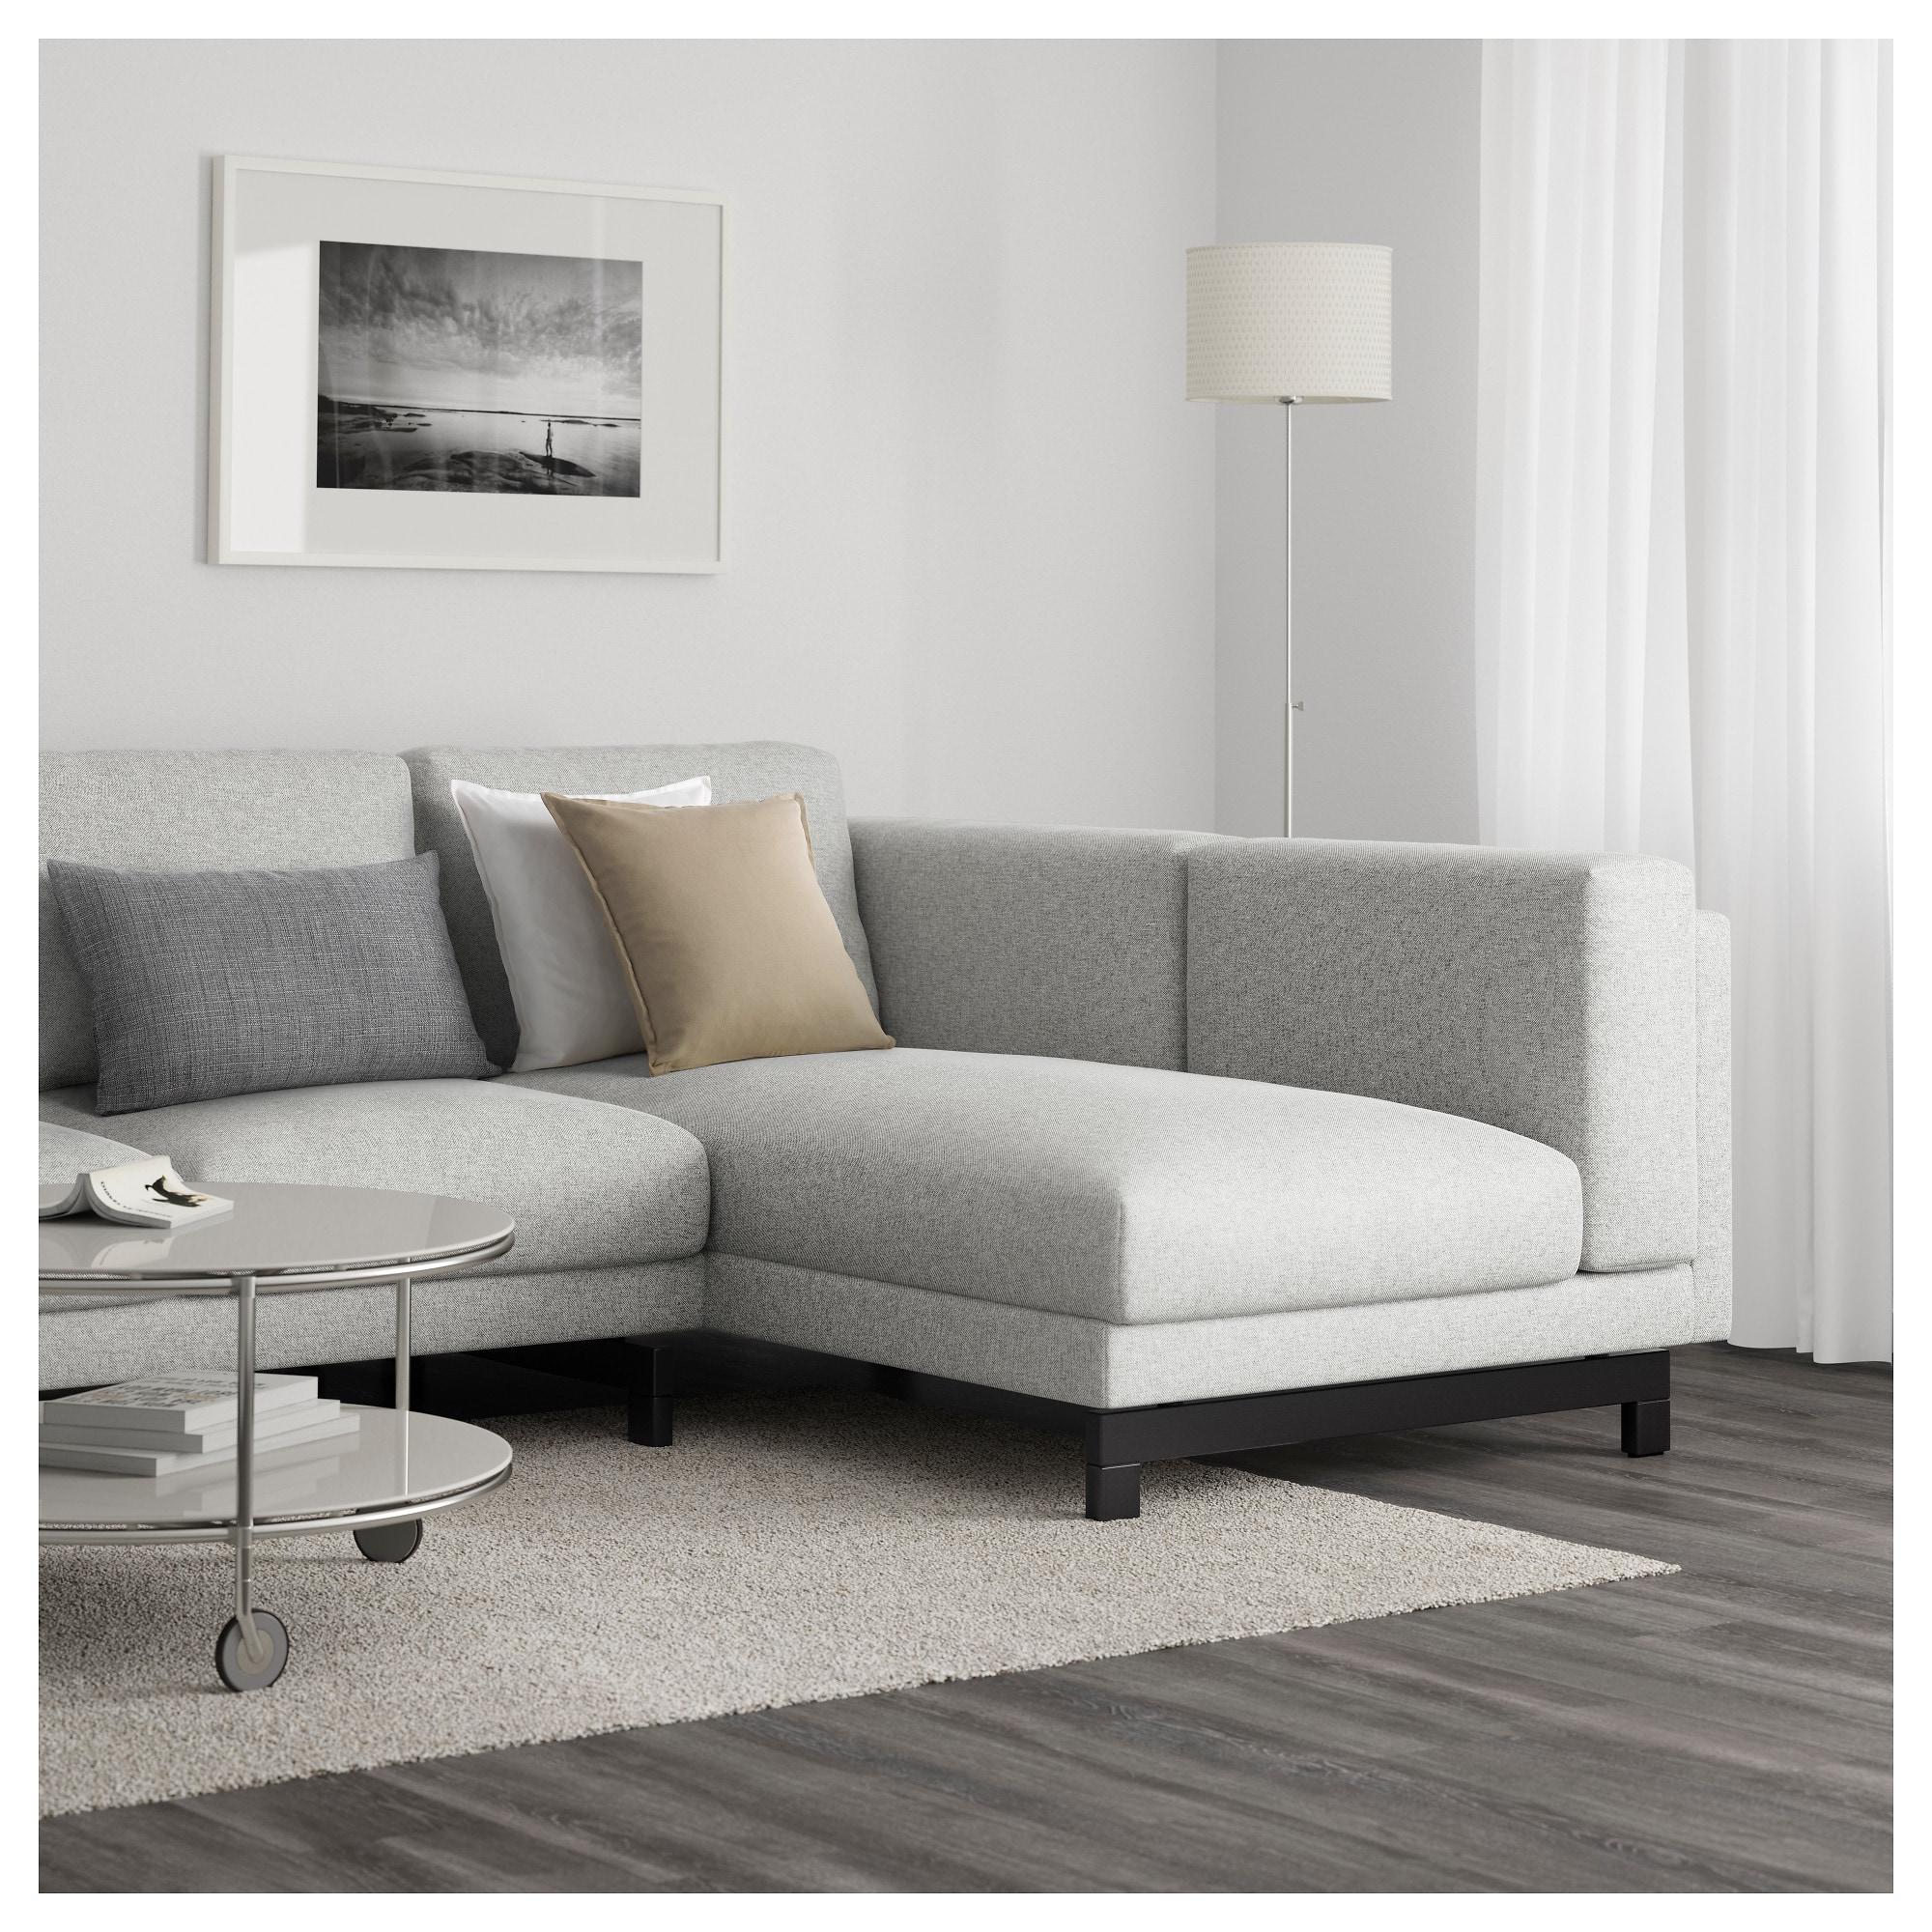 Sofa Nockeby Xtd6 Nockeby 3 Seat sofa with Chaise Longue Left Tallmyra White Black